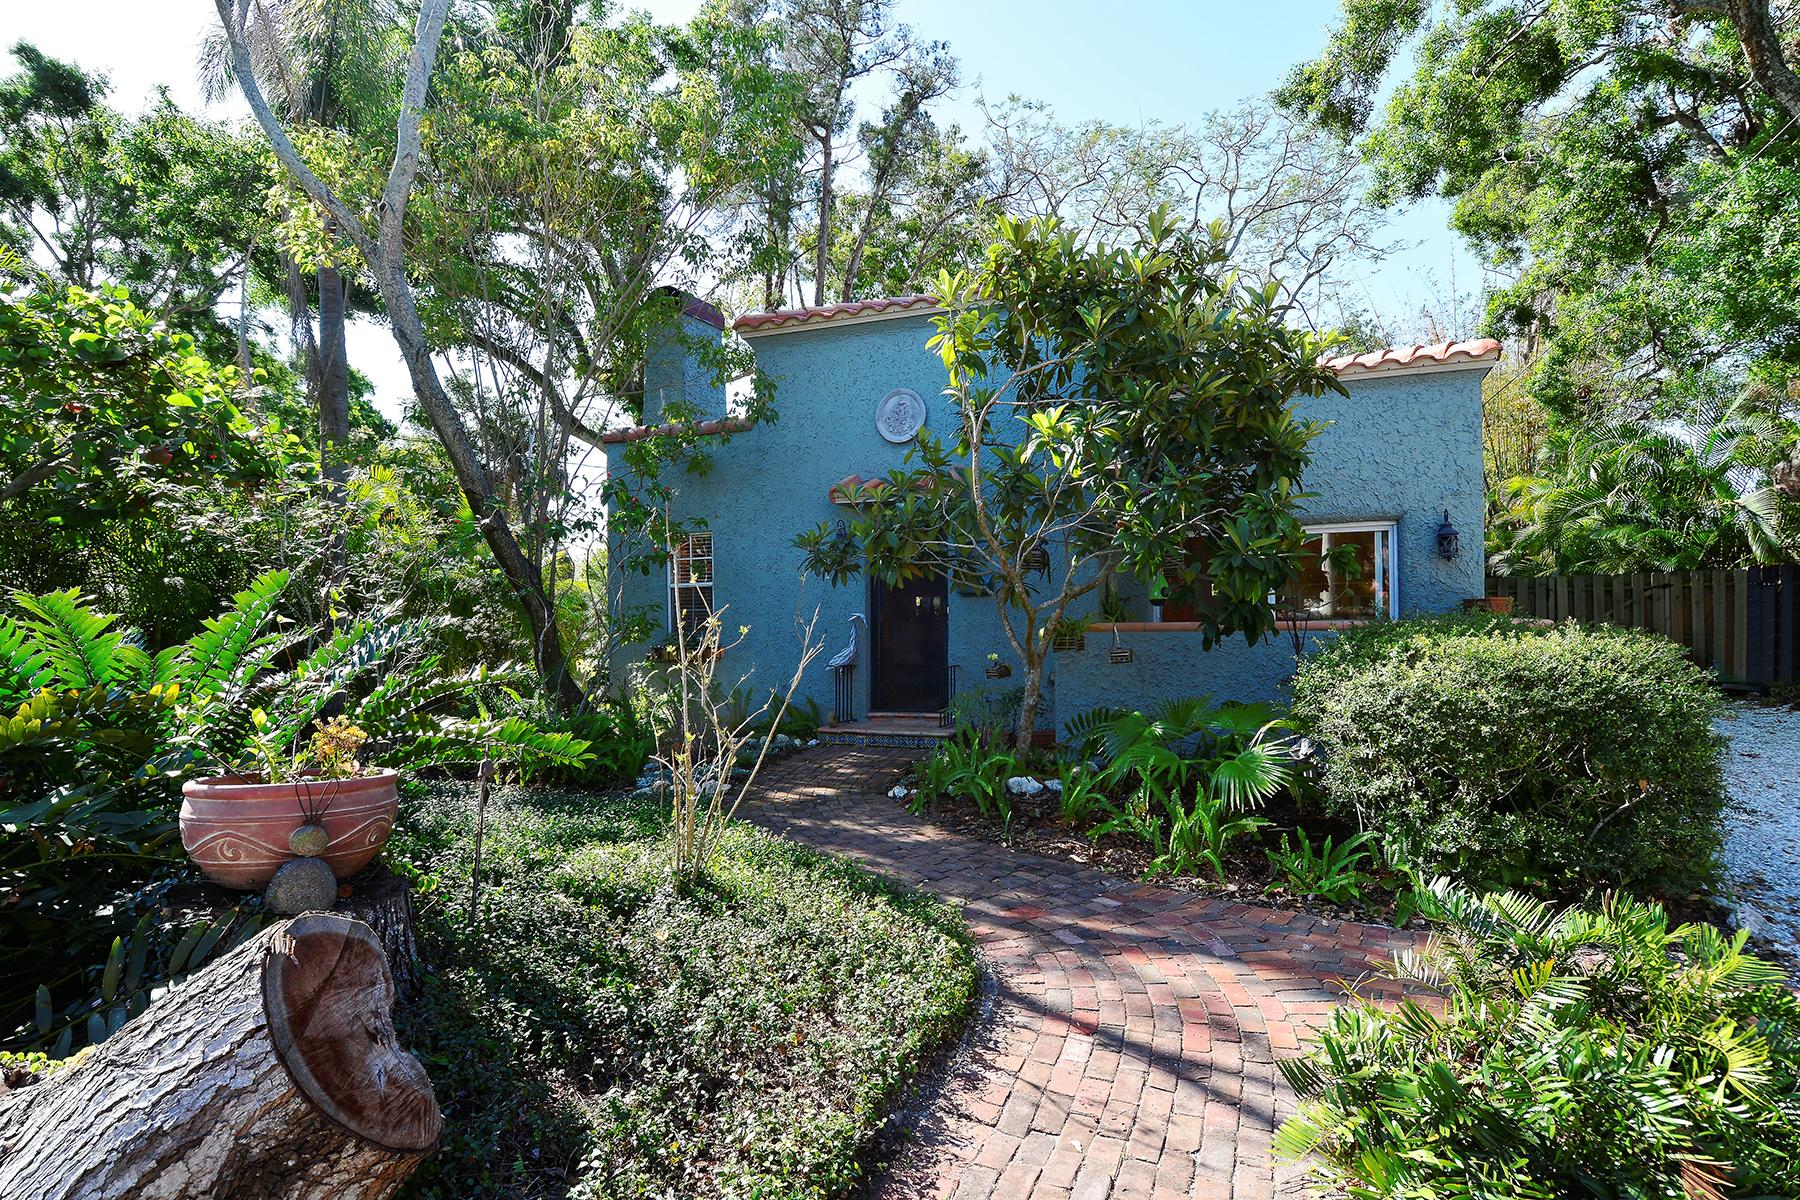 Single Family Home for Sale at HISTORIC LAUREL PARK 1646 Oak St, Sarasota, Florida 34236 United States